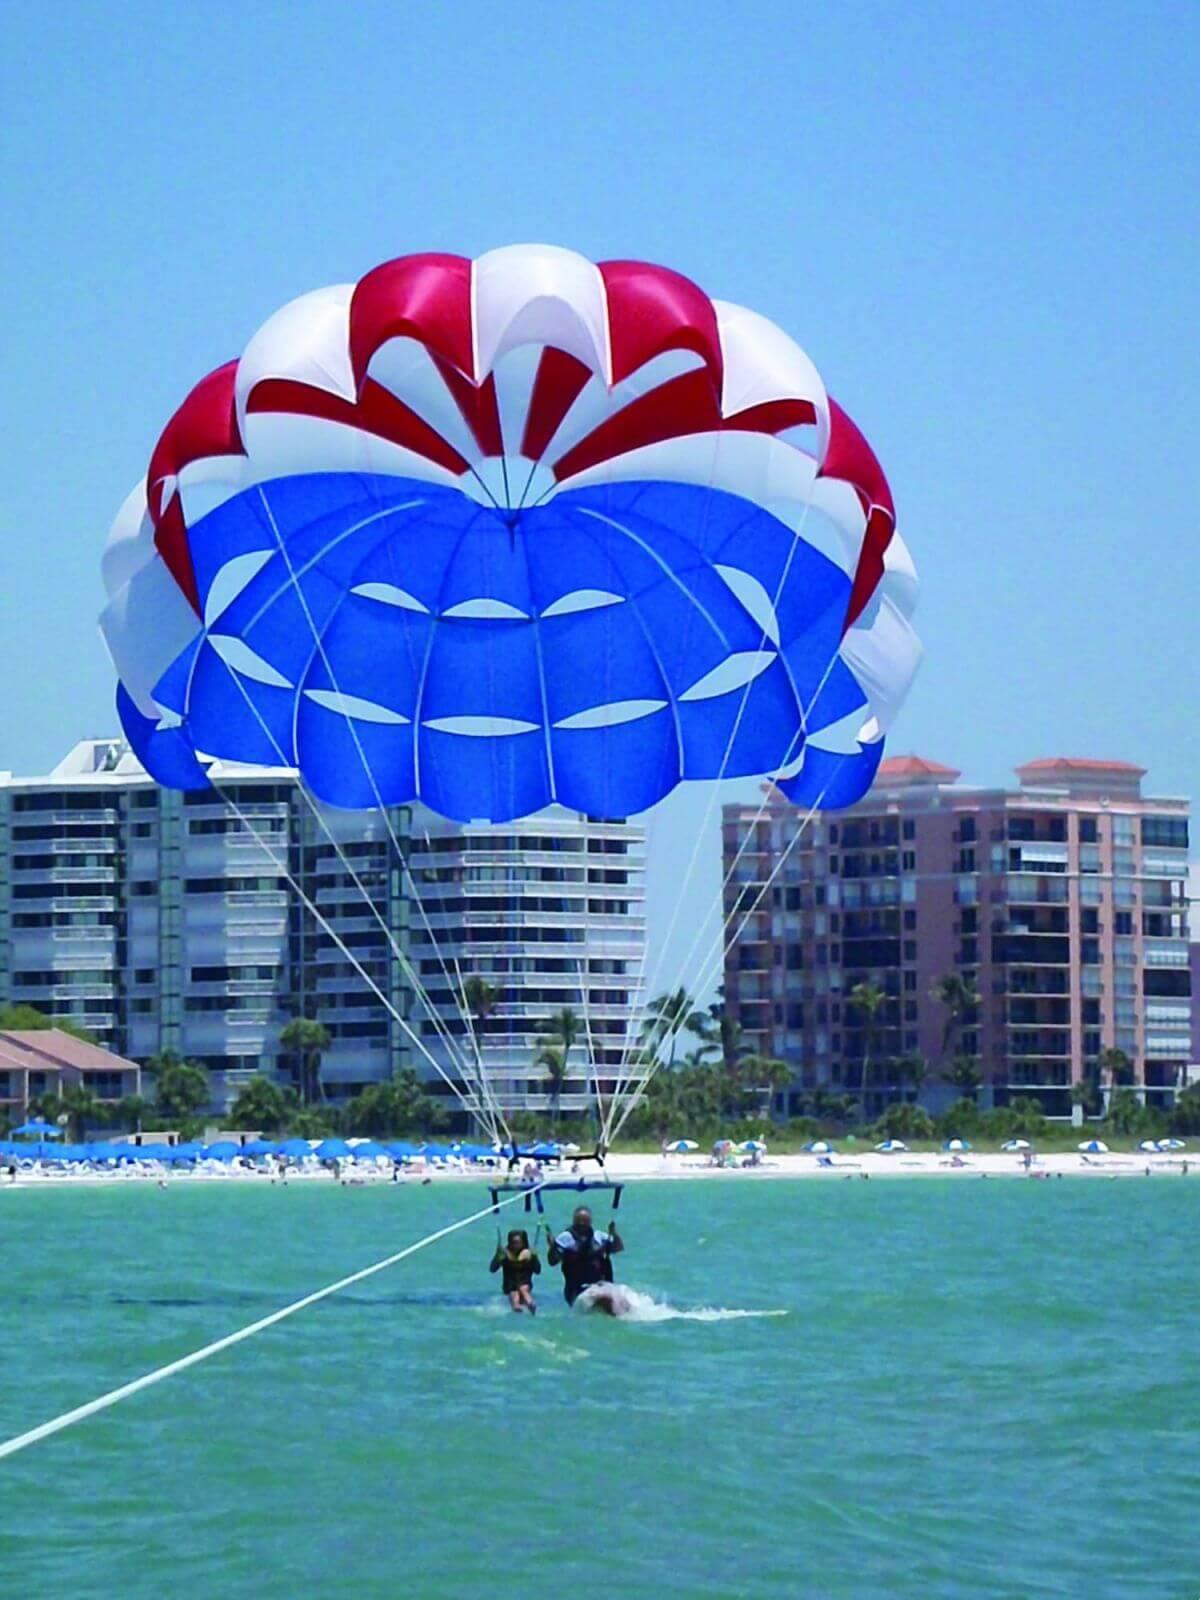 Parasailing along the beach in Marco Island, Florida.